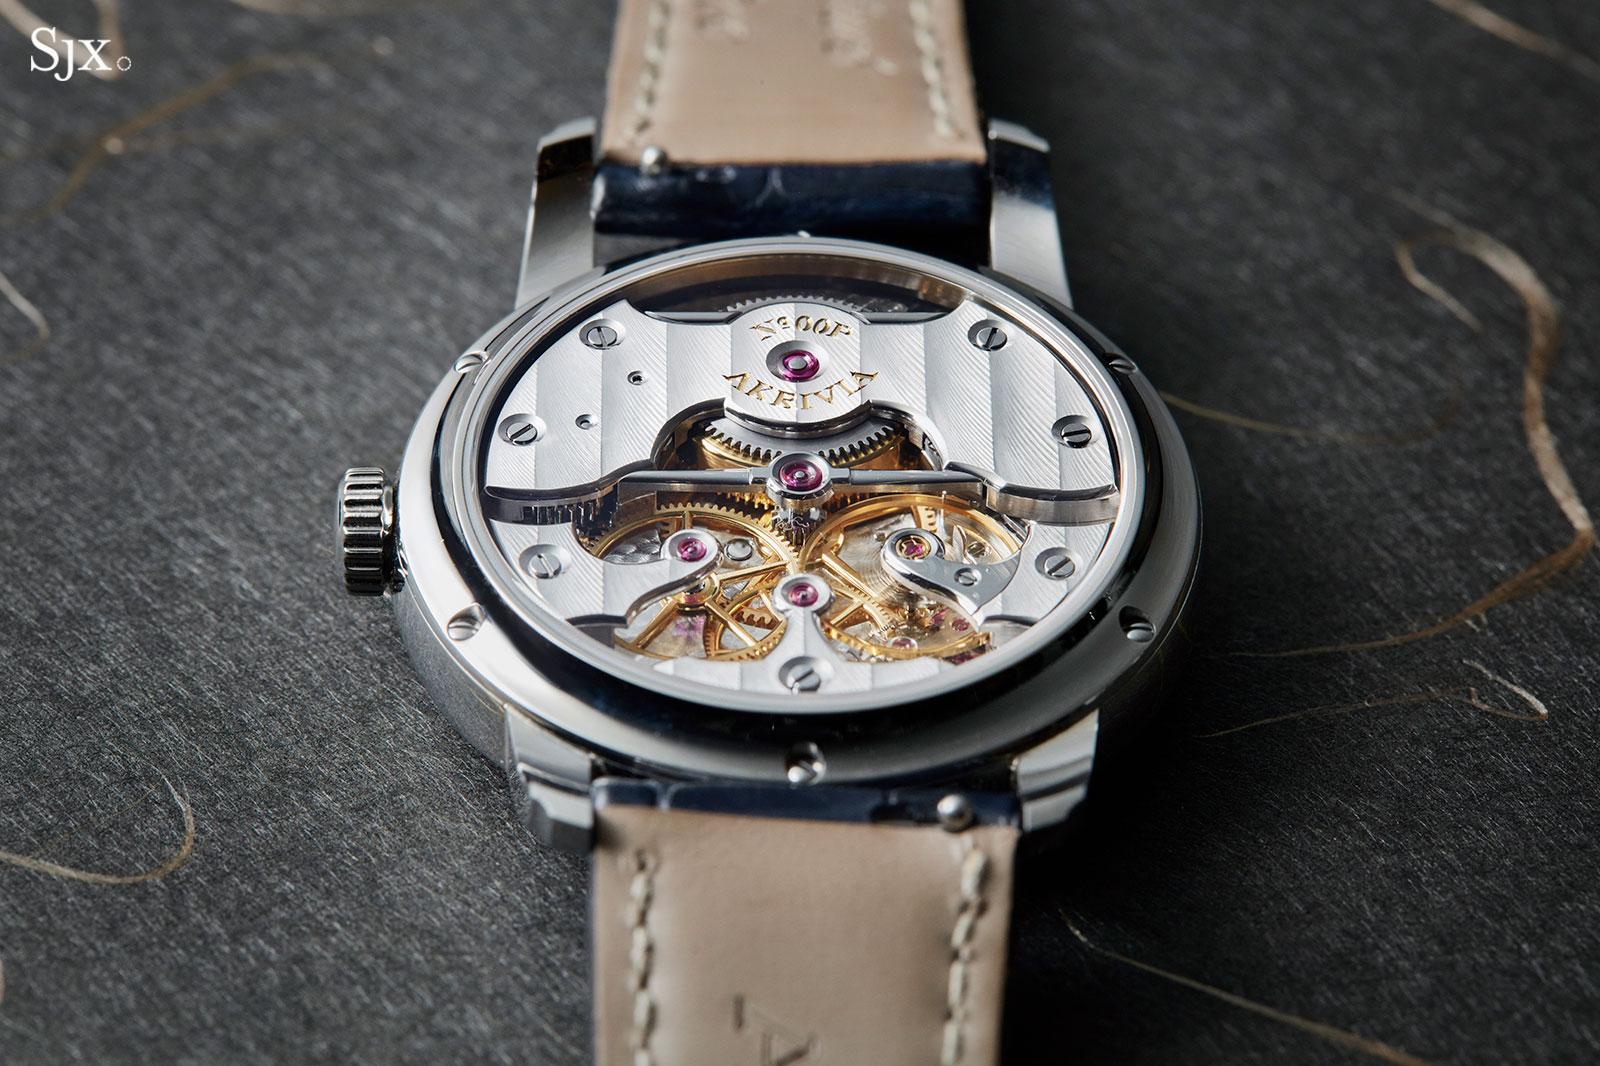 Akrivia Chronometre Contemporain Rexhep Rexhepi 14